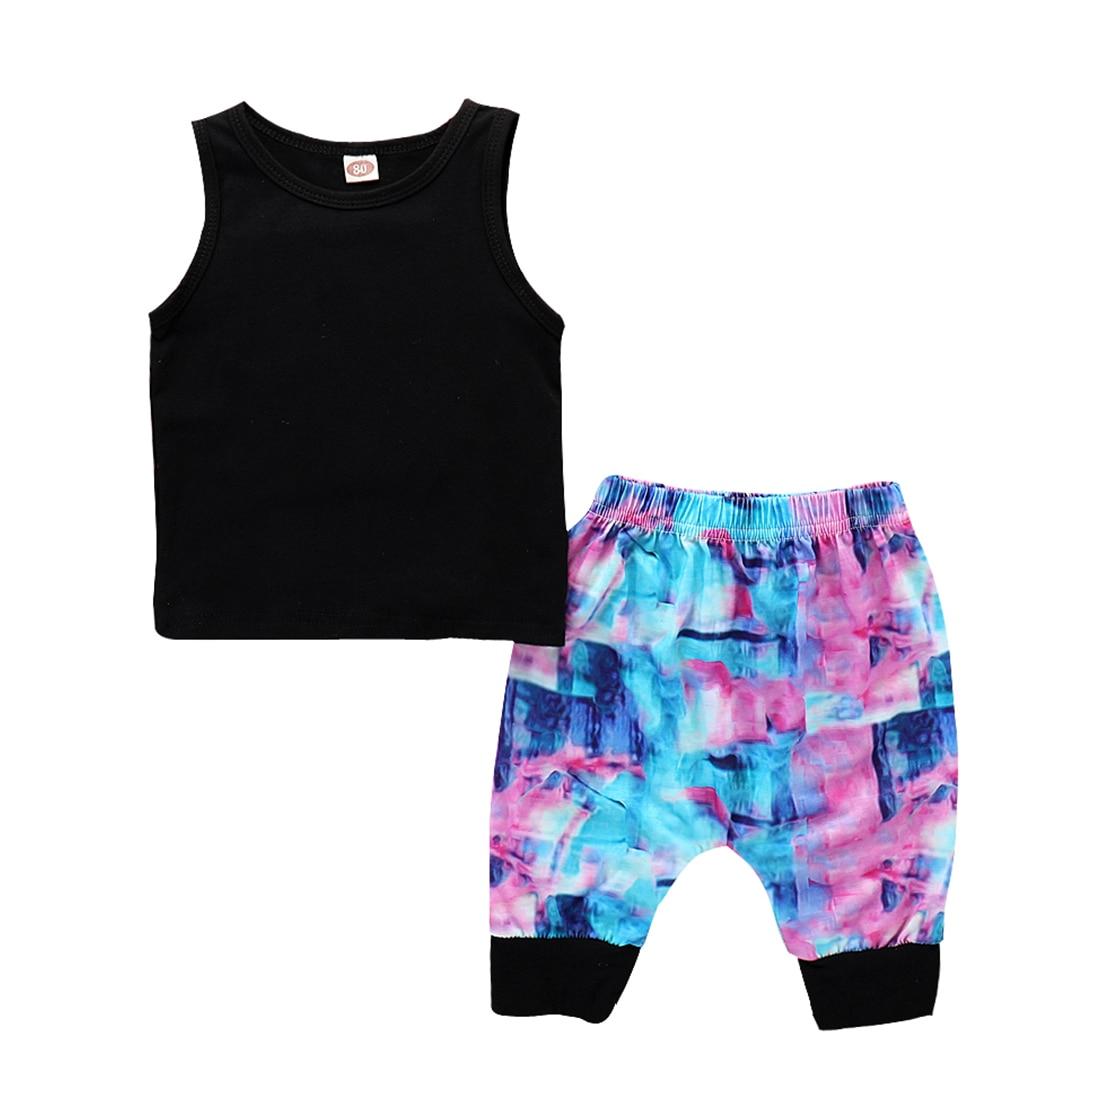 Straightforward Casual Daily Wear Children Party Sleeveless Boy Holiday Beach Set Vest+pants Kids Tanks Girls Vest